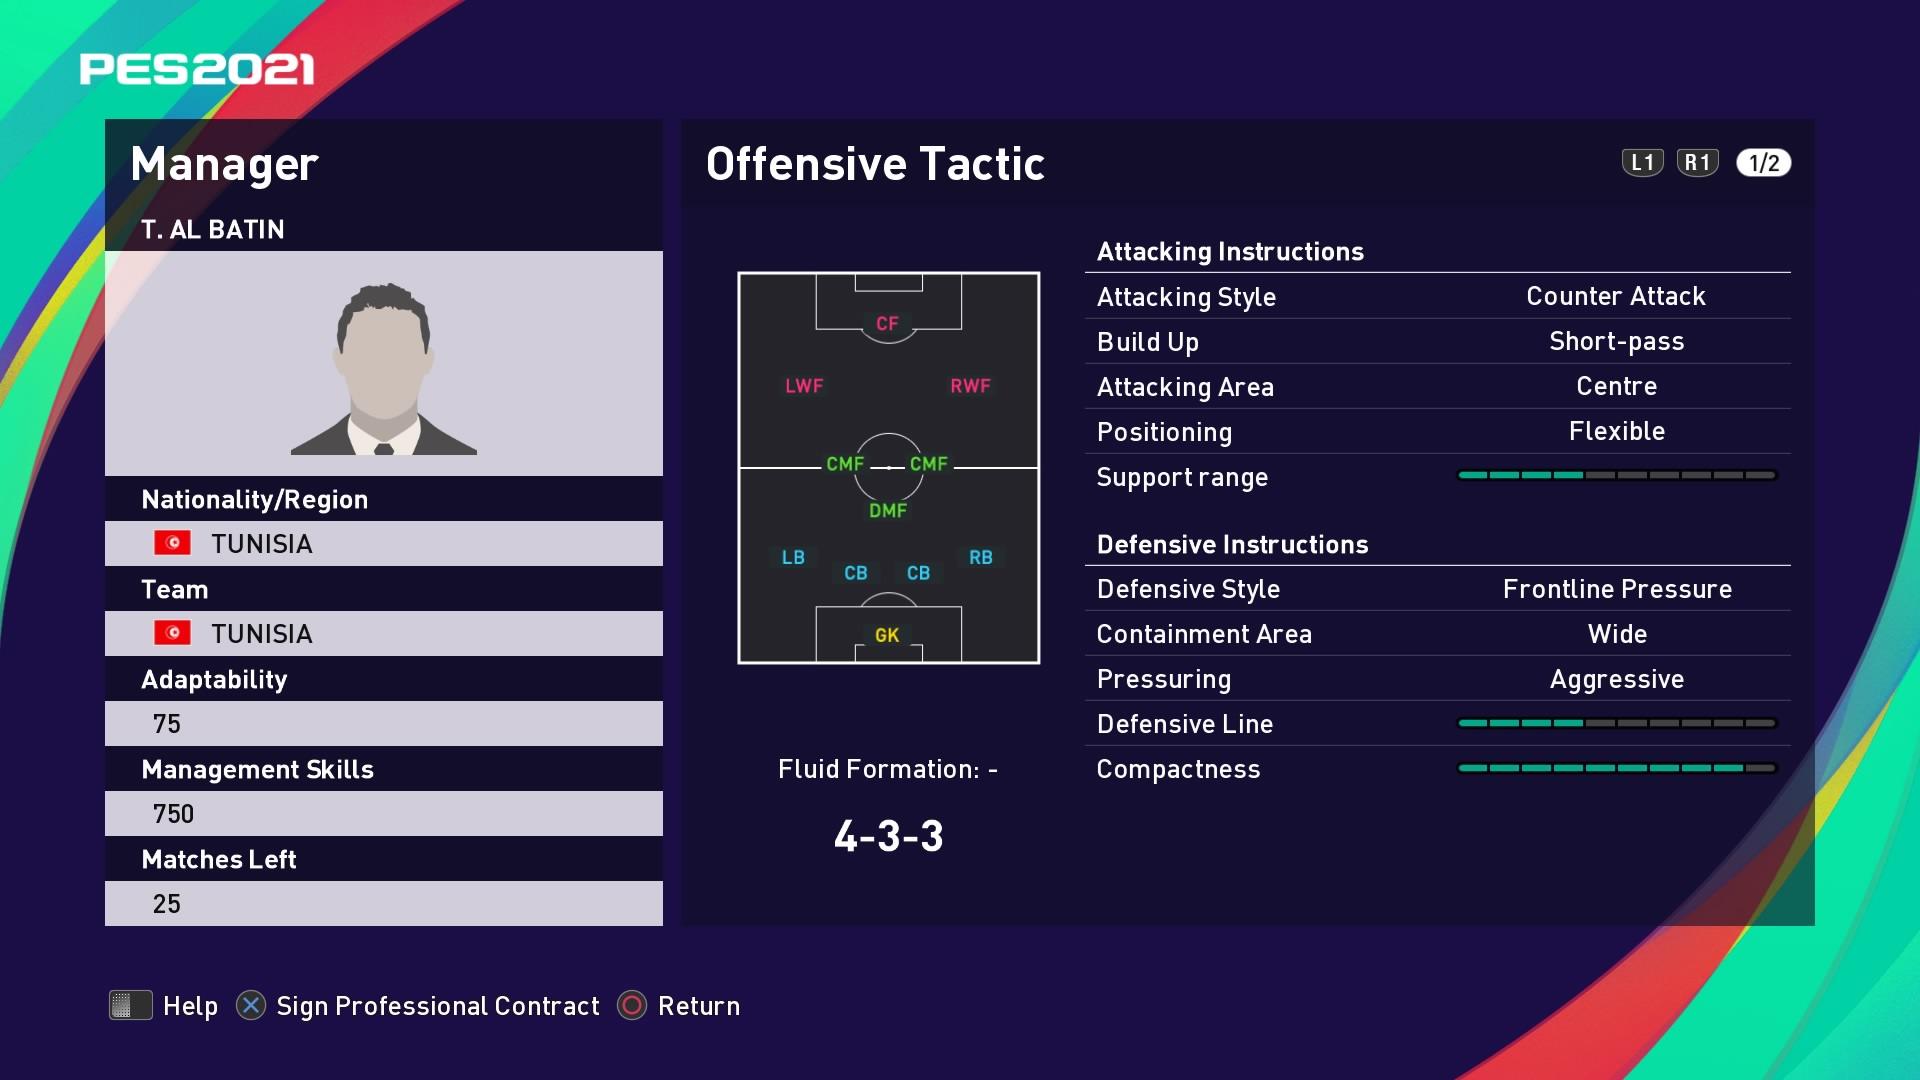 T. Al Batin (Mondher Kebaier) Offensive Tactic in PES 2021 myClub